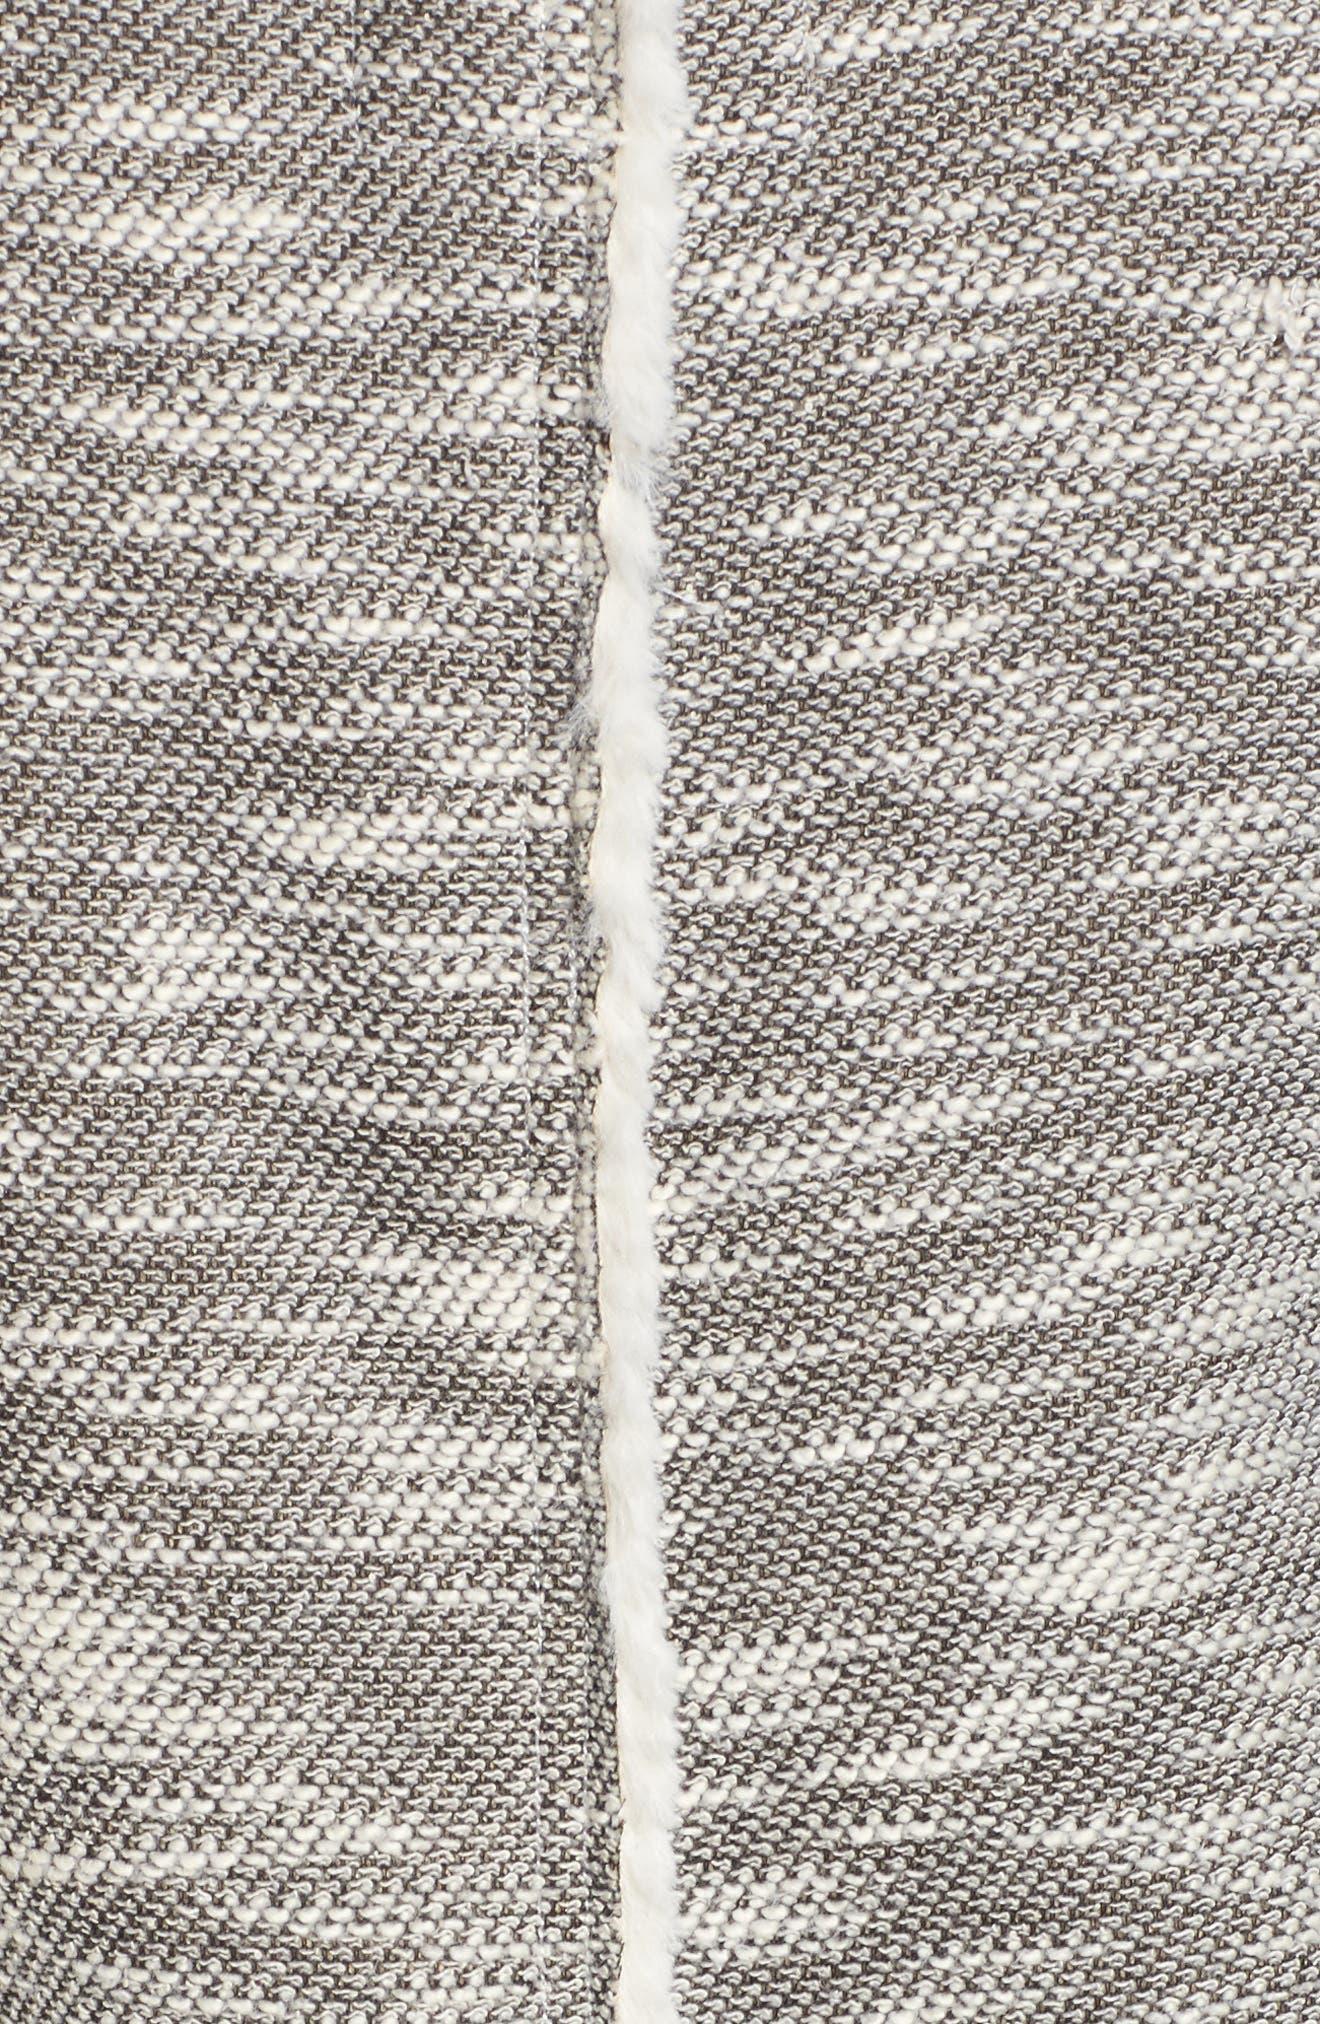 Faux Shearling Vest,                             Alternate thumbnail 5, color,                             Black/ White